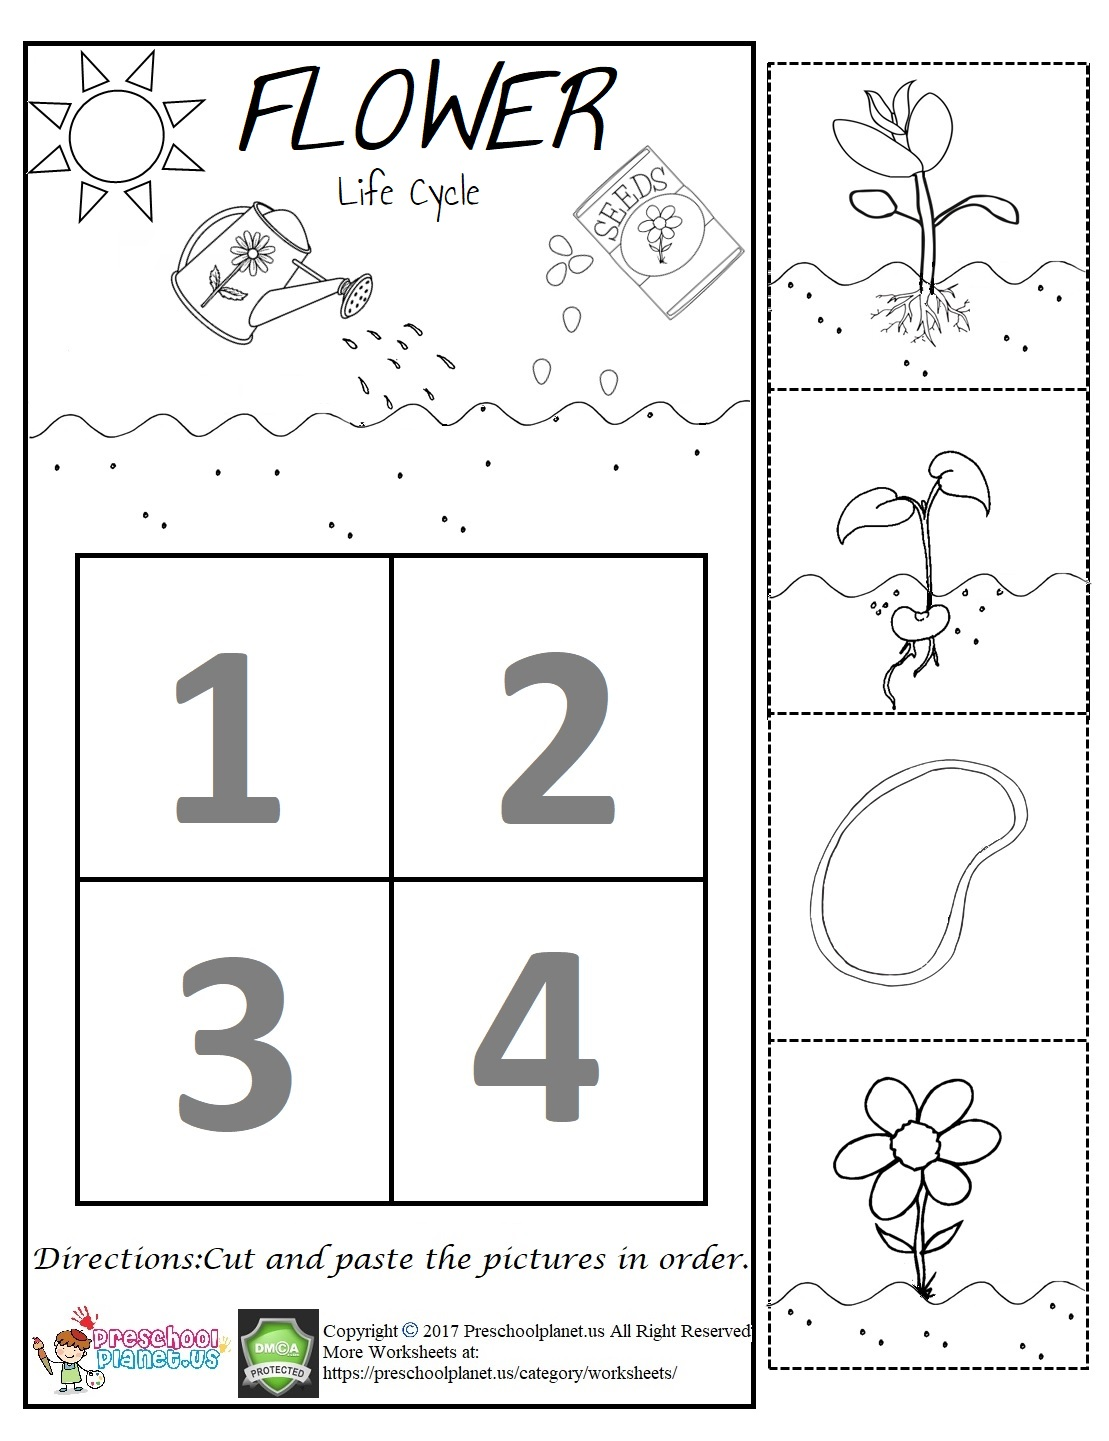 Spring Worksheet Preschoolplanet